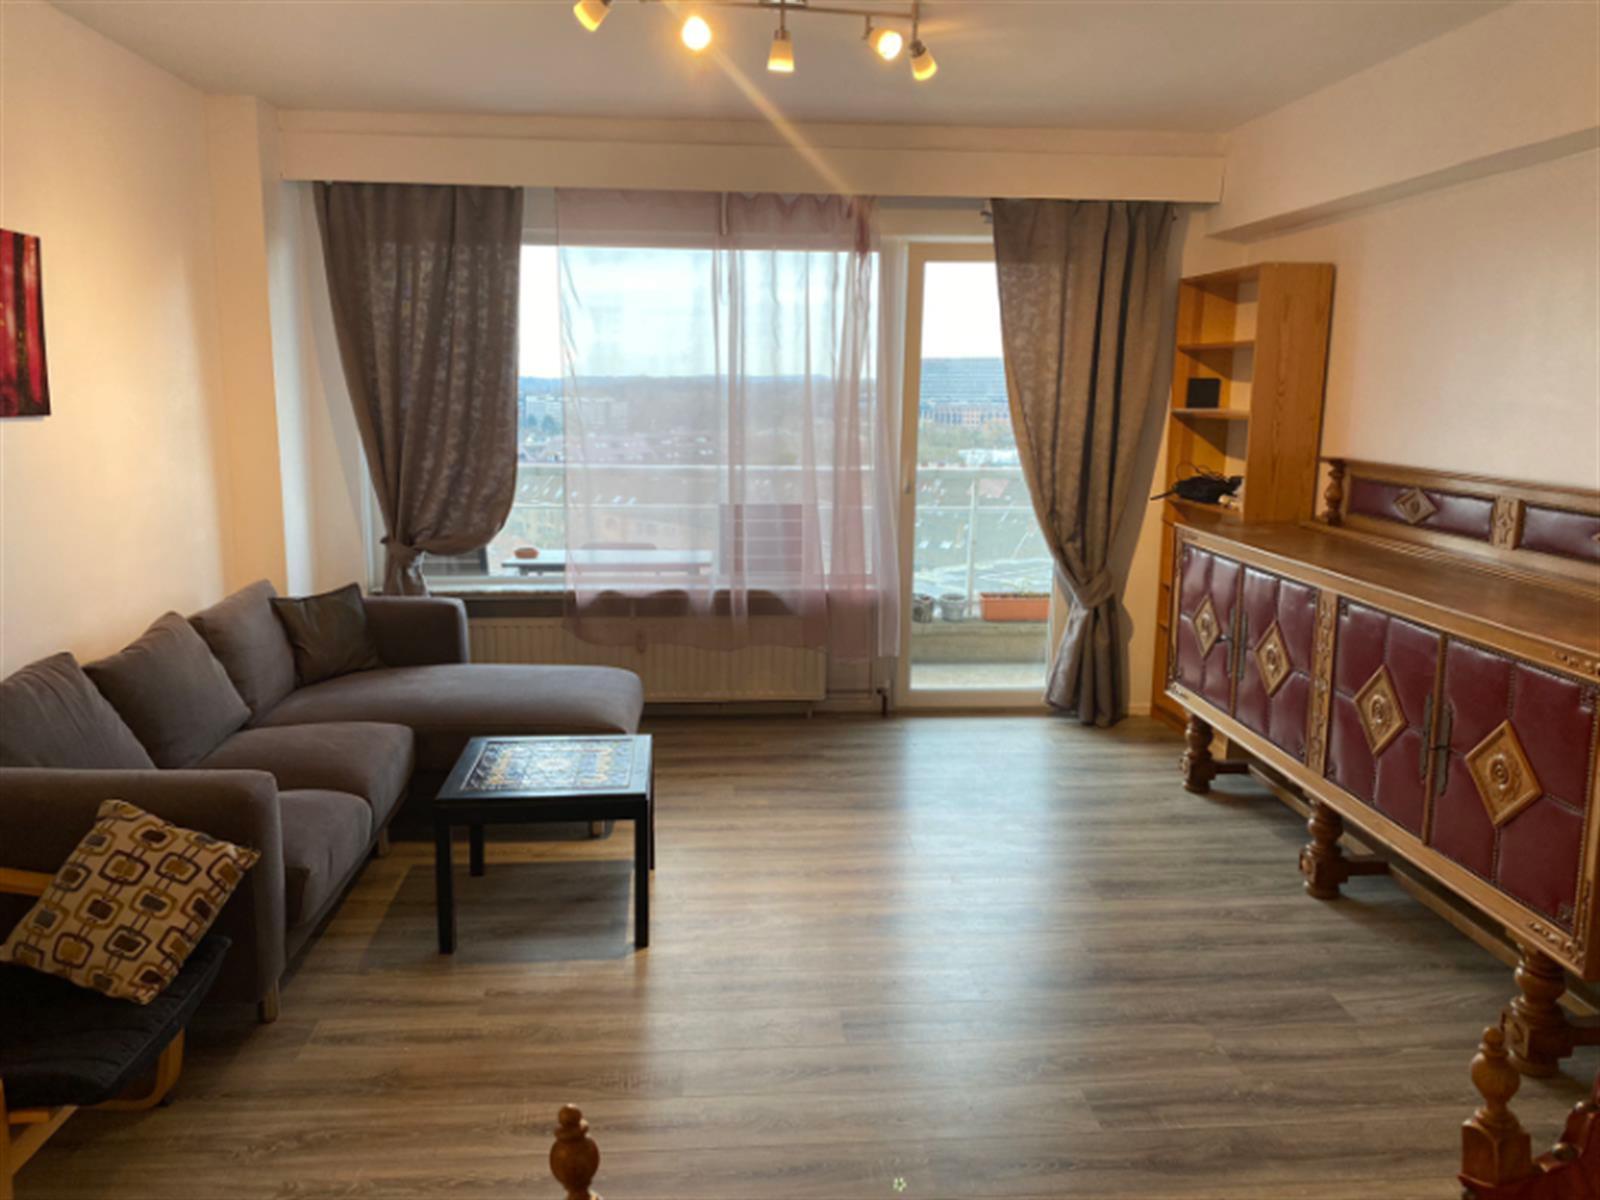 Appartement - Woluwe-Saint-Lambert - #4025134-0